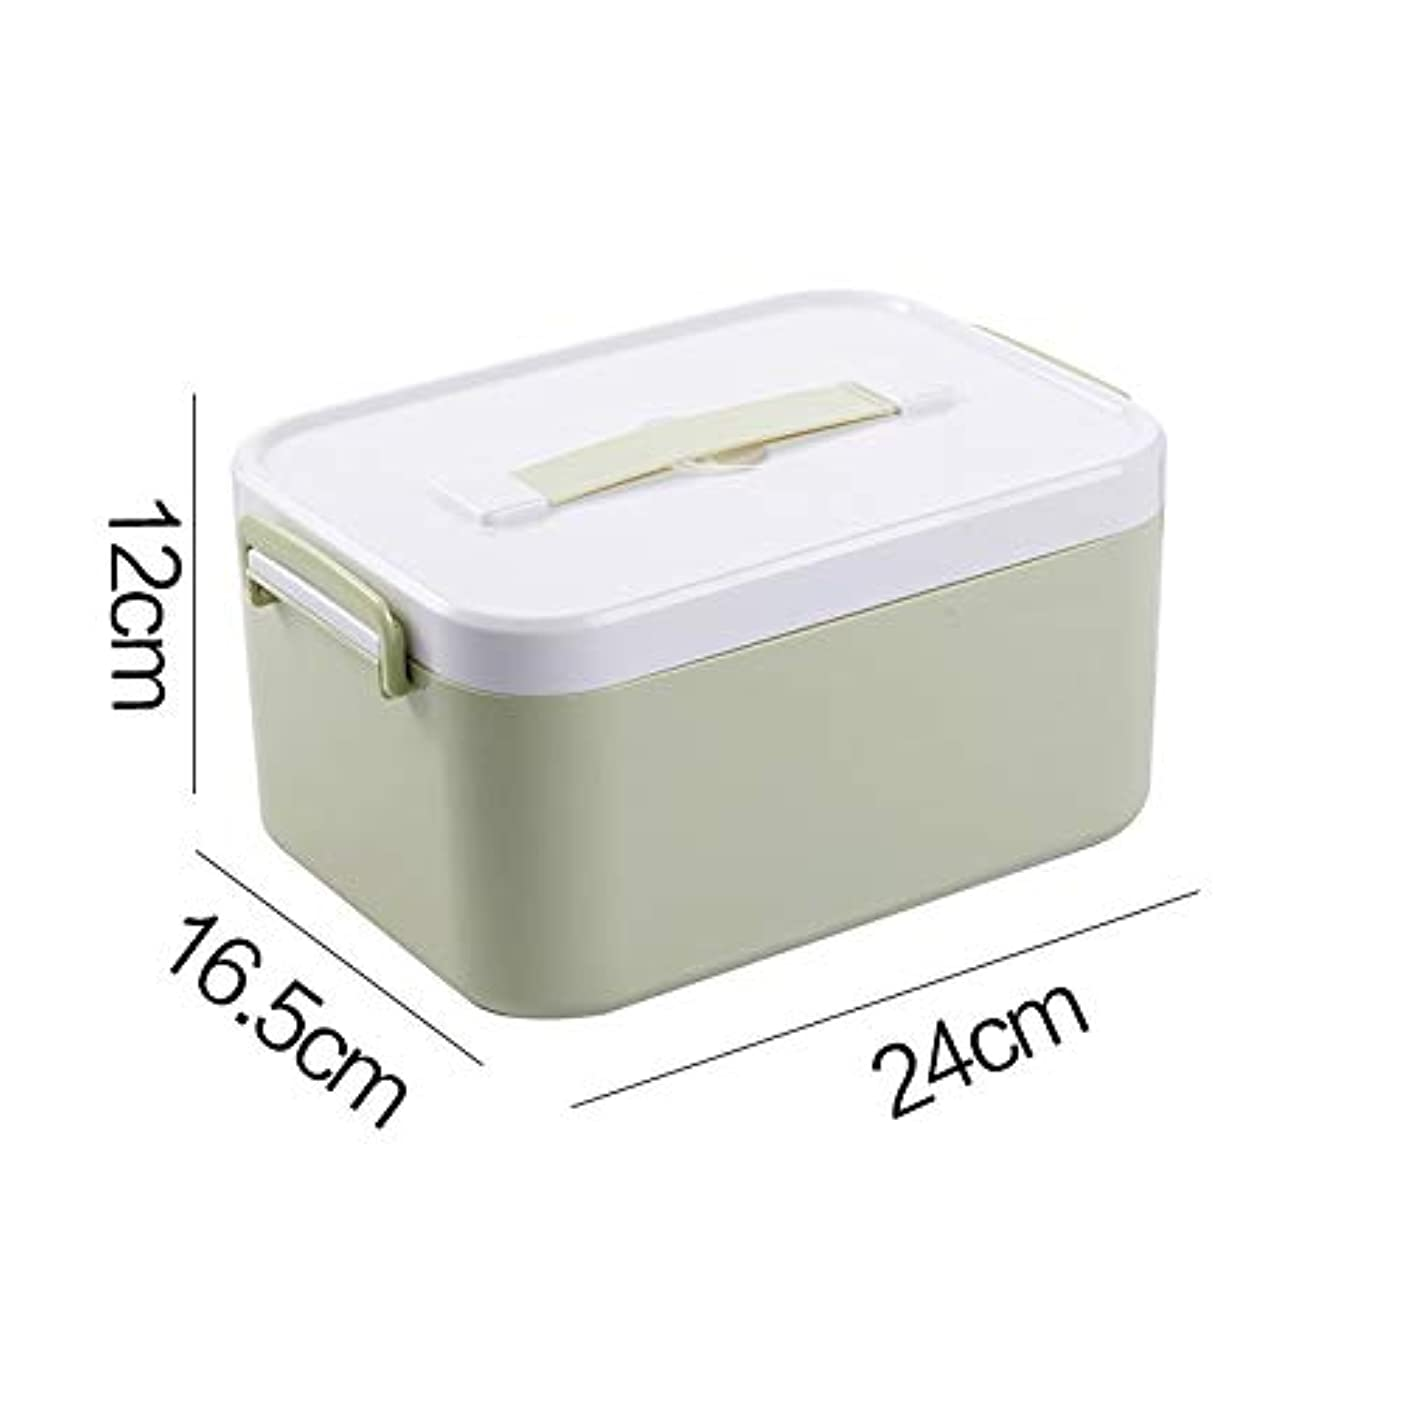 HTDZDX 薬箱収納ボックス、職場応急処置キット、ファミリープラスチック応急処置収納ボックス (Color : Single layer, Size : S)